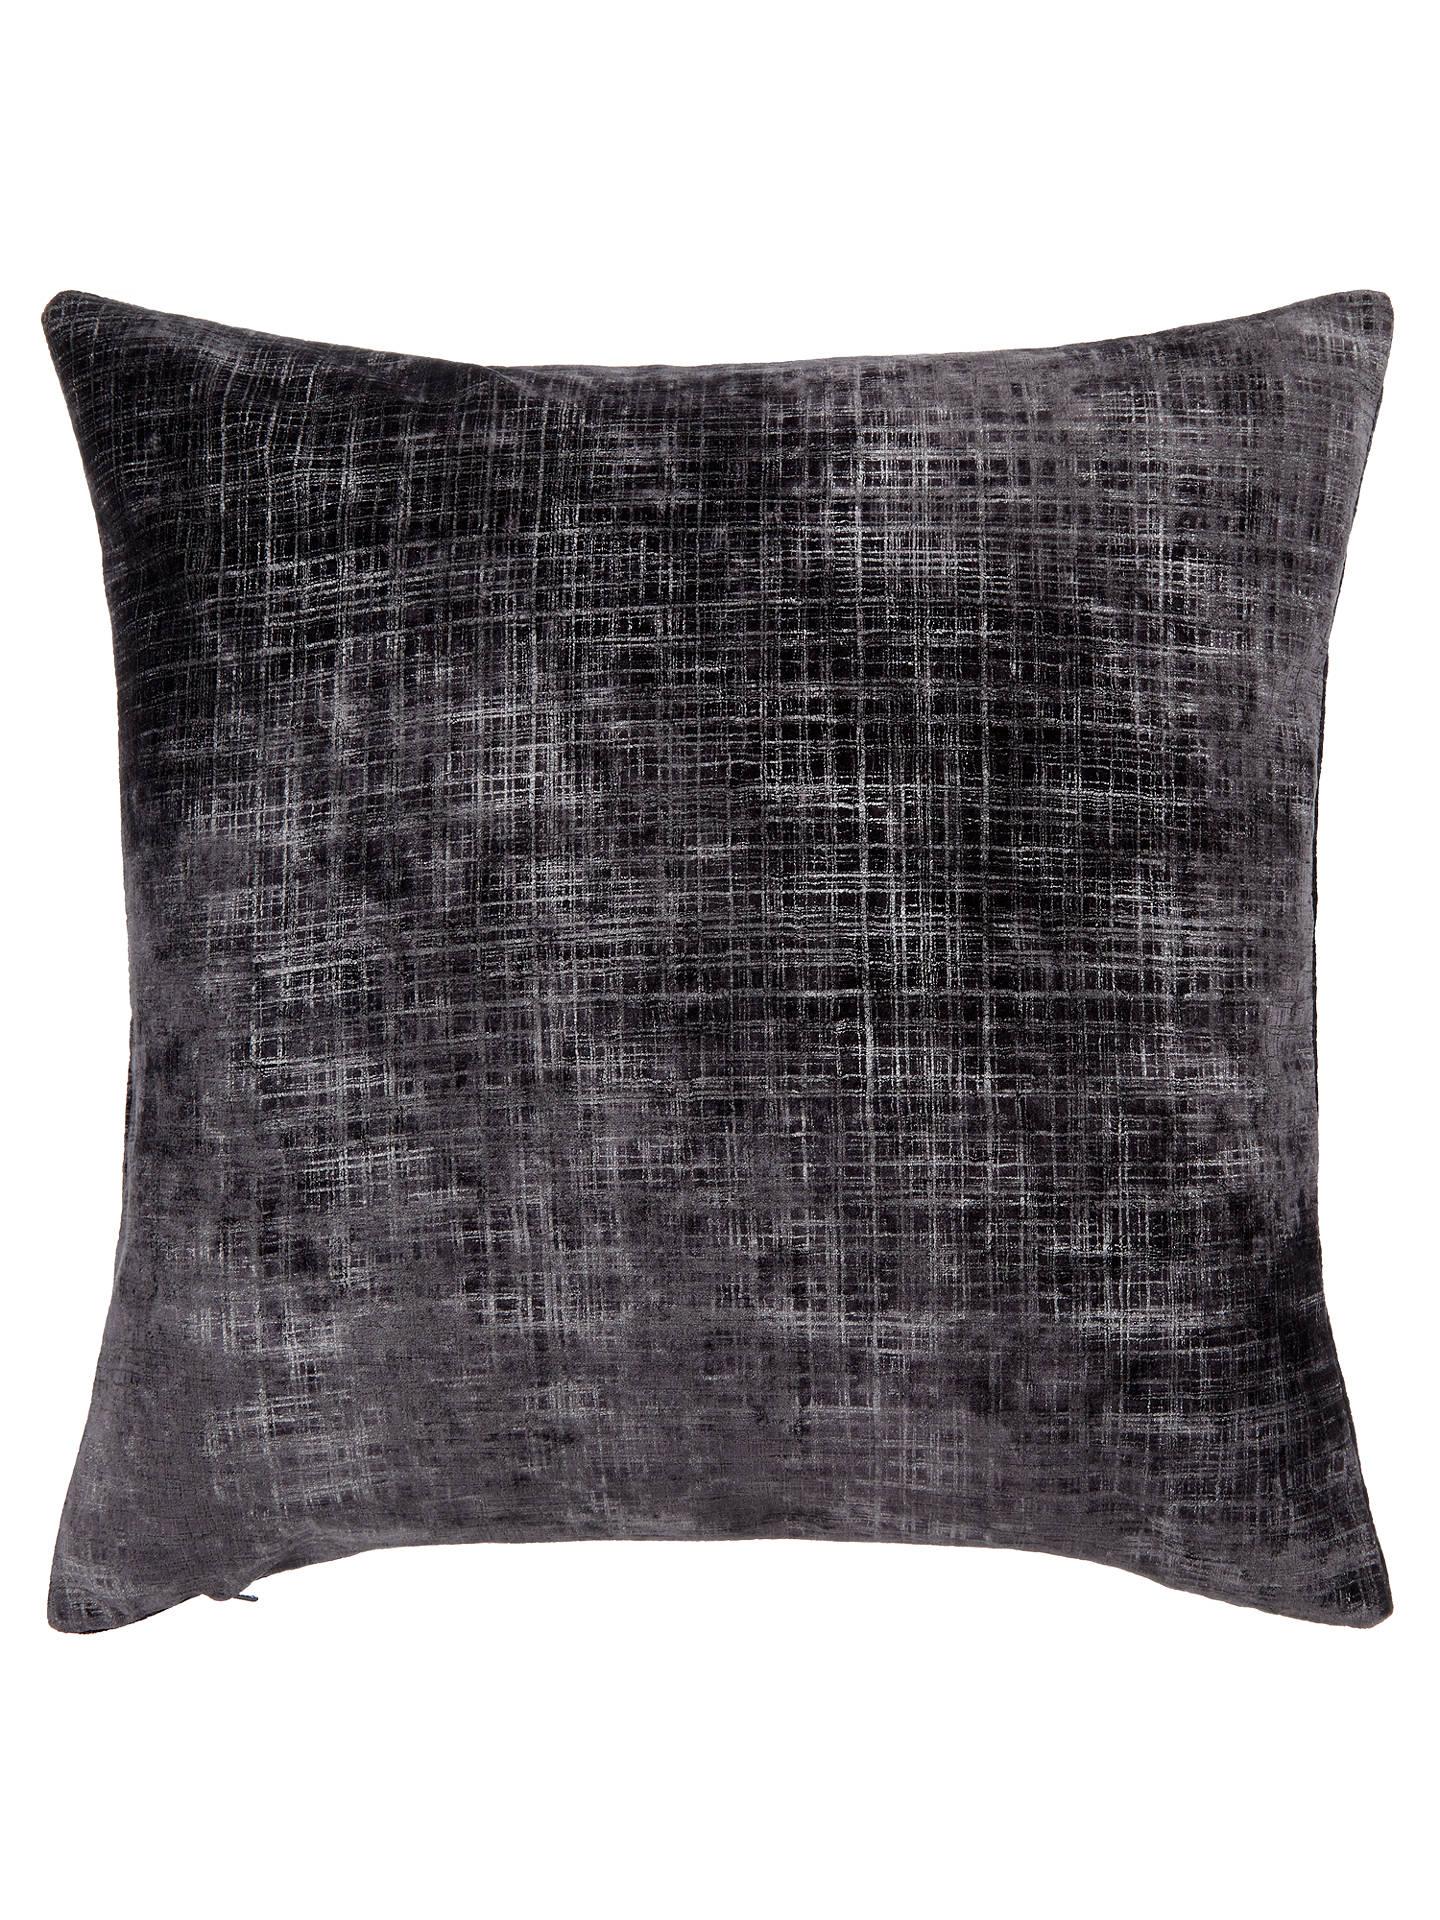 john lewis partners bordoni cushion at john lewis partners. Black Bedroom Furniture Sets. Home Design Ideas